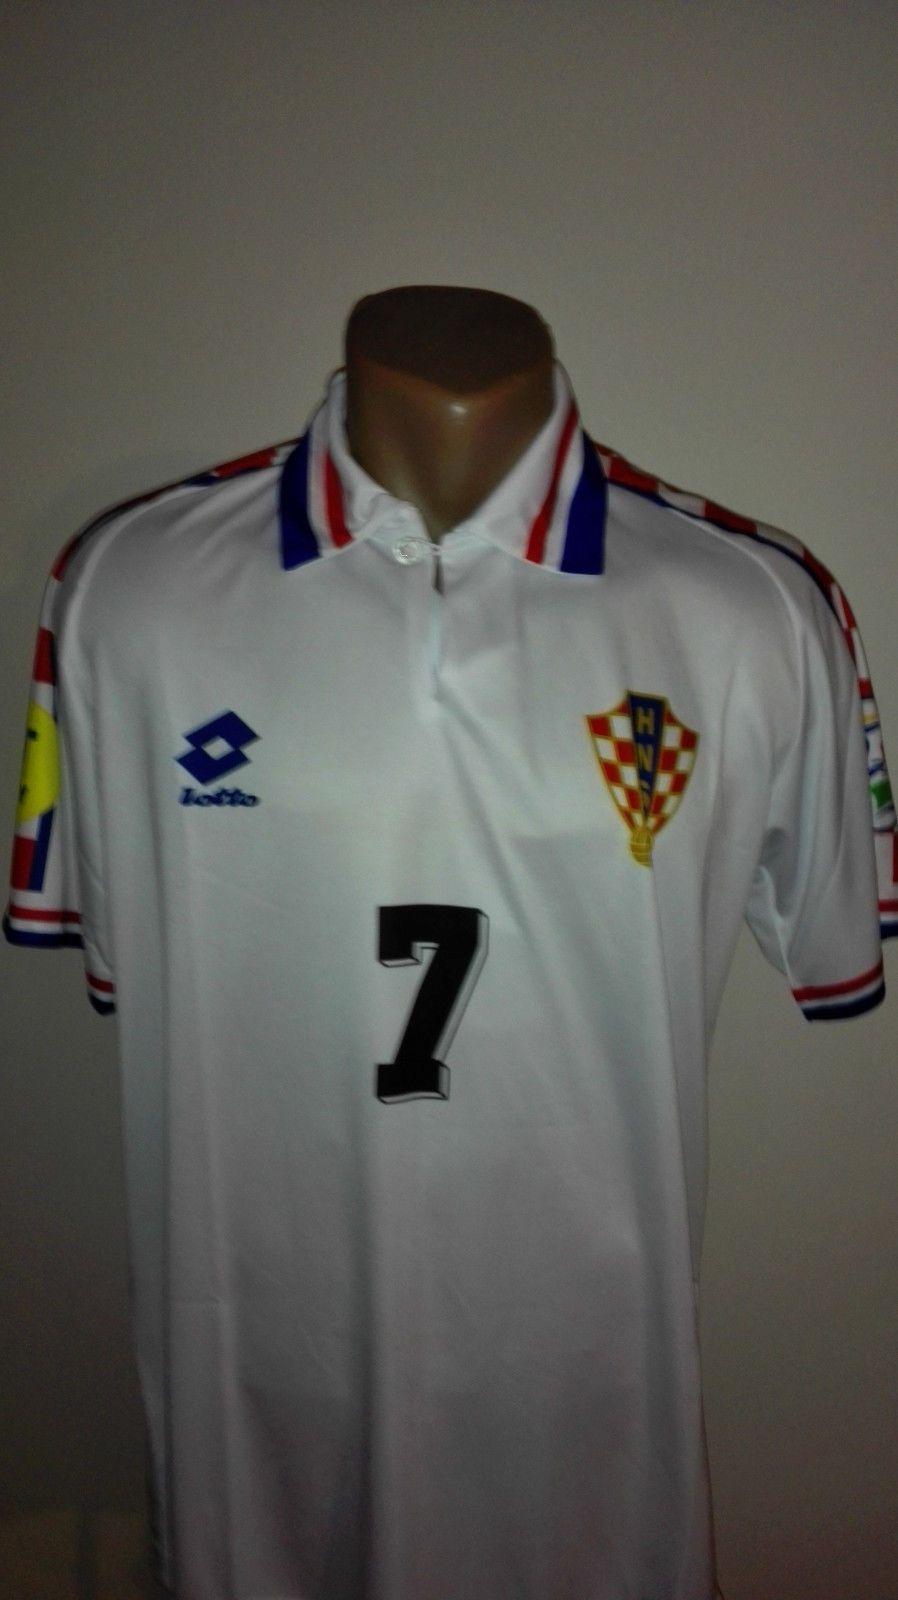 653dc8a6b Details about CROATIA Retro Football Jersey EURO 1996 Trikot Soccer Shirt  ASANOVIC HRVATSKA